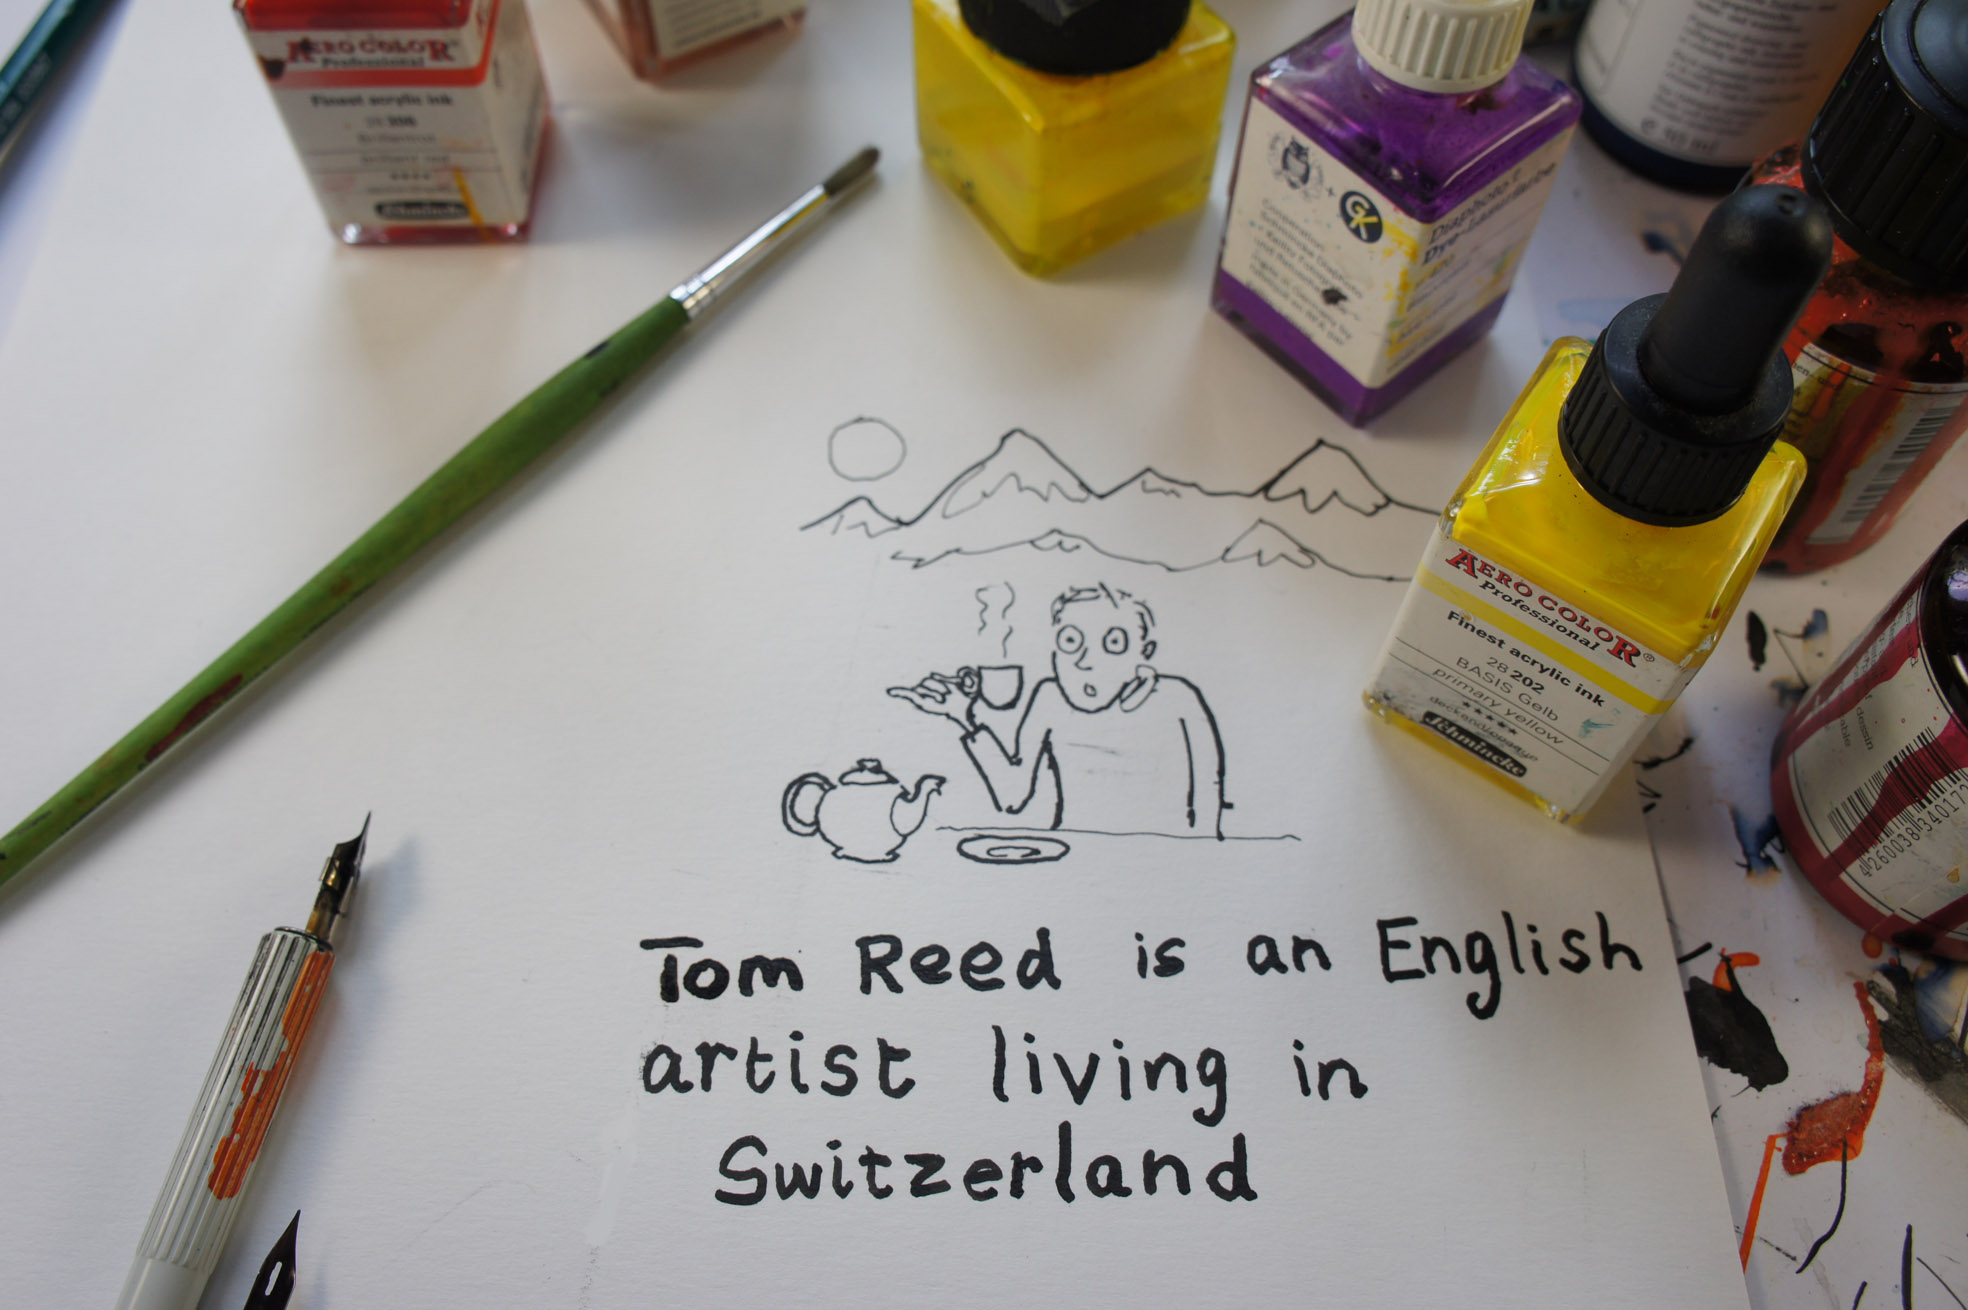 Tom Reed description